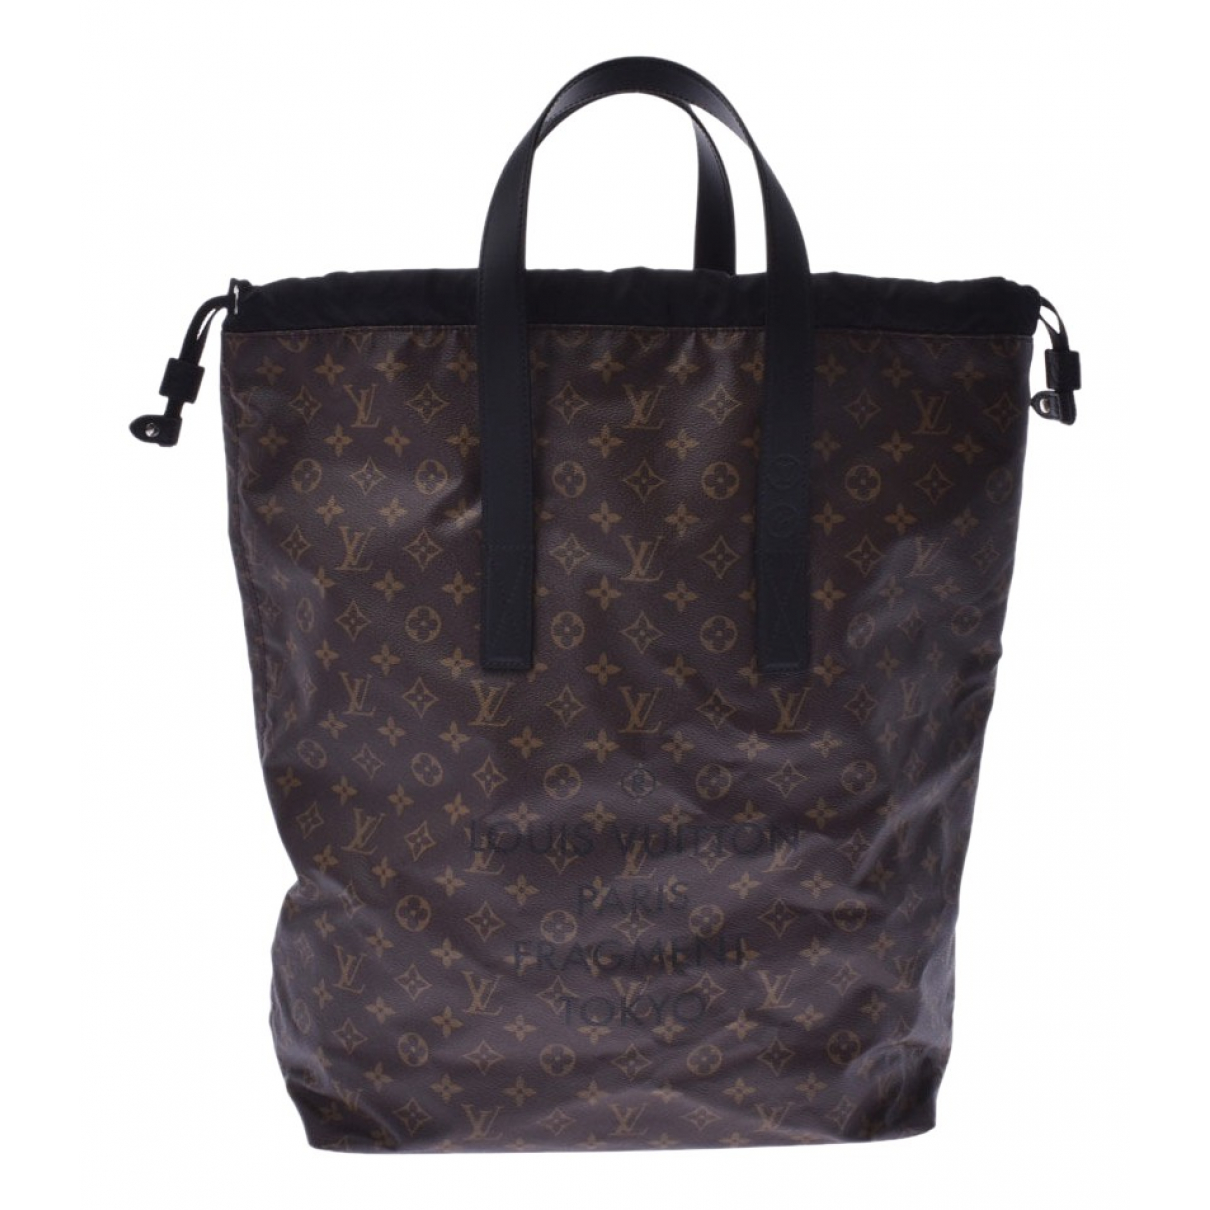 Cabas de Lona Louis Vuitton